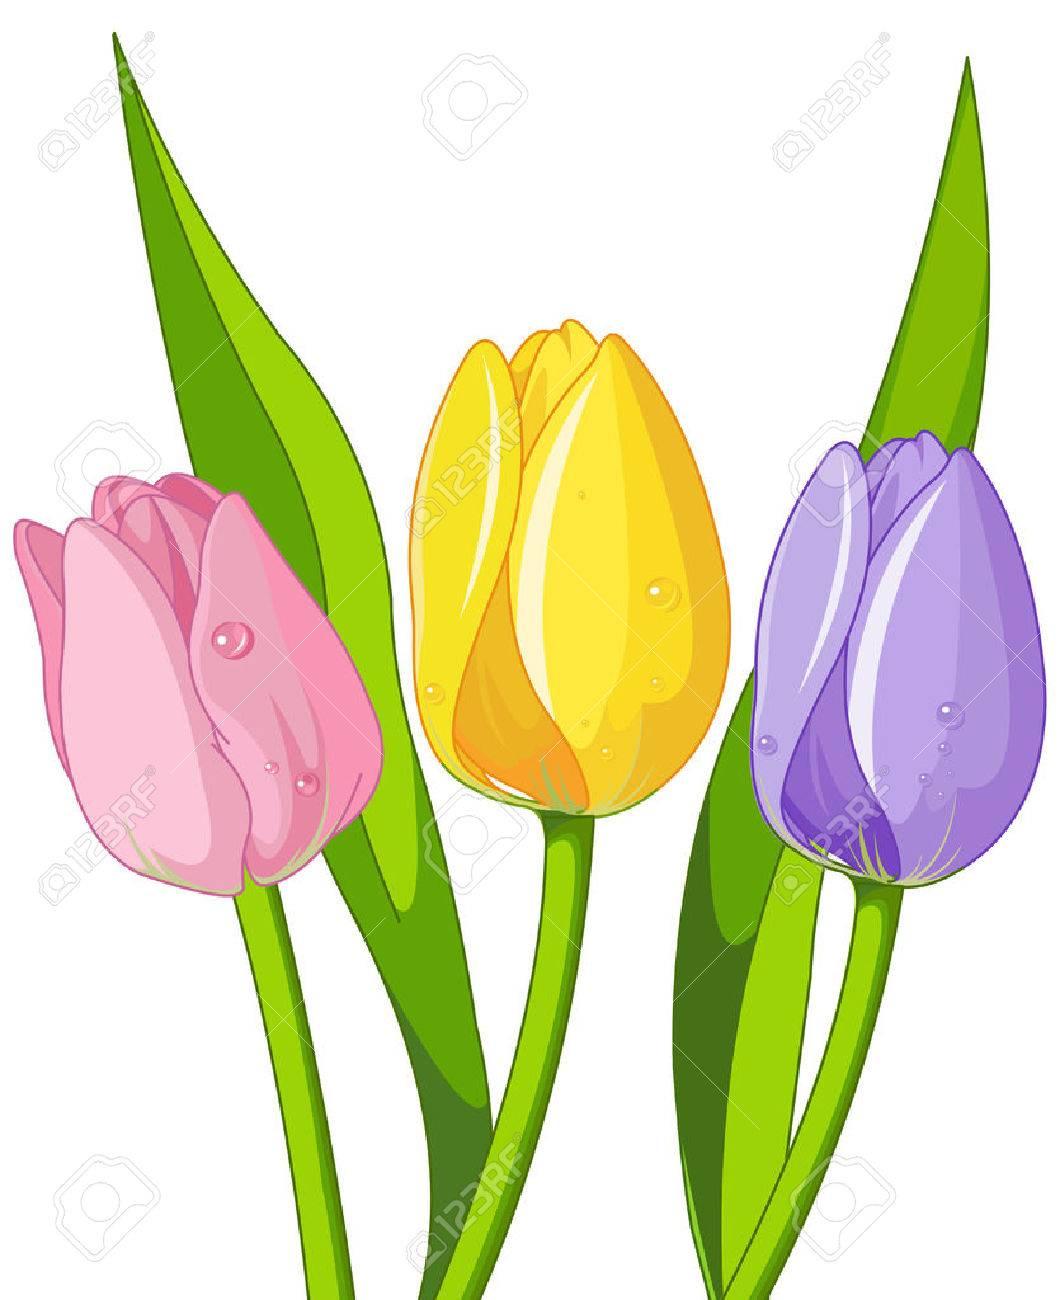 Illustration of bouquet tulips - 50902230